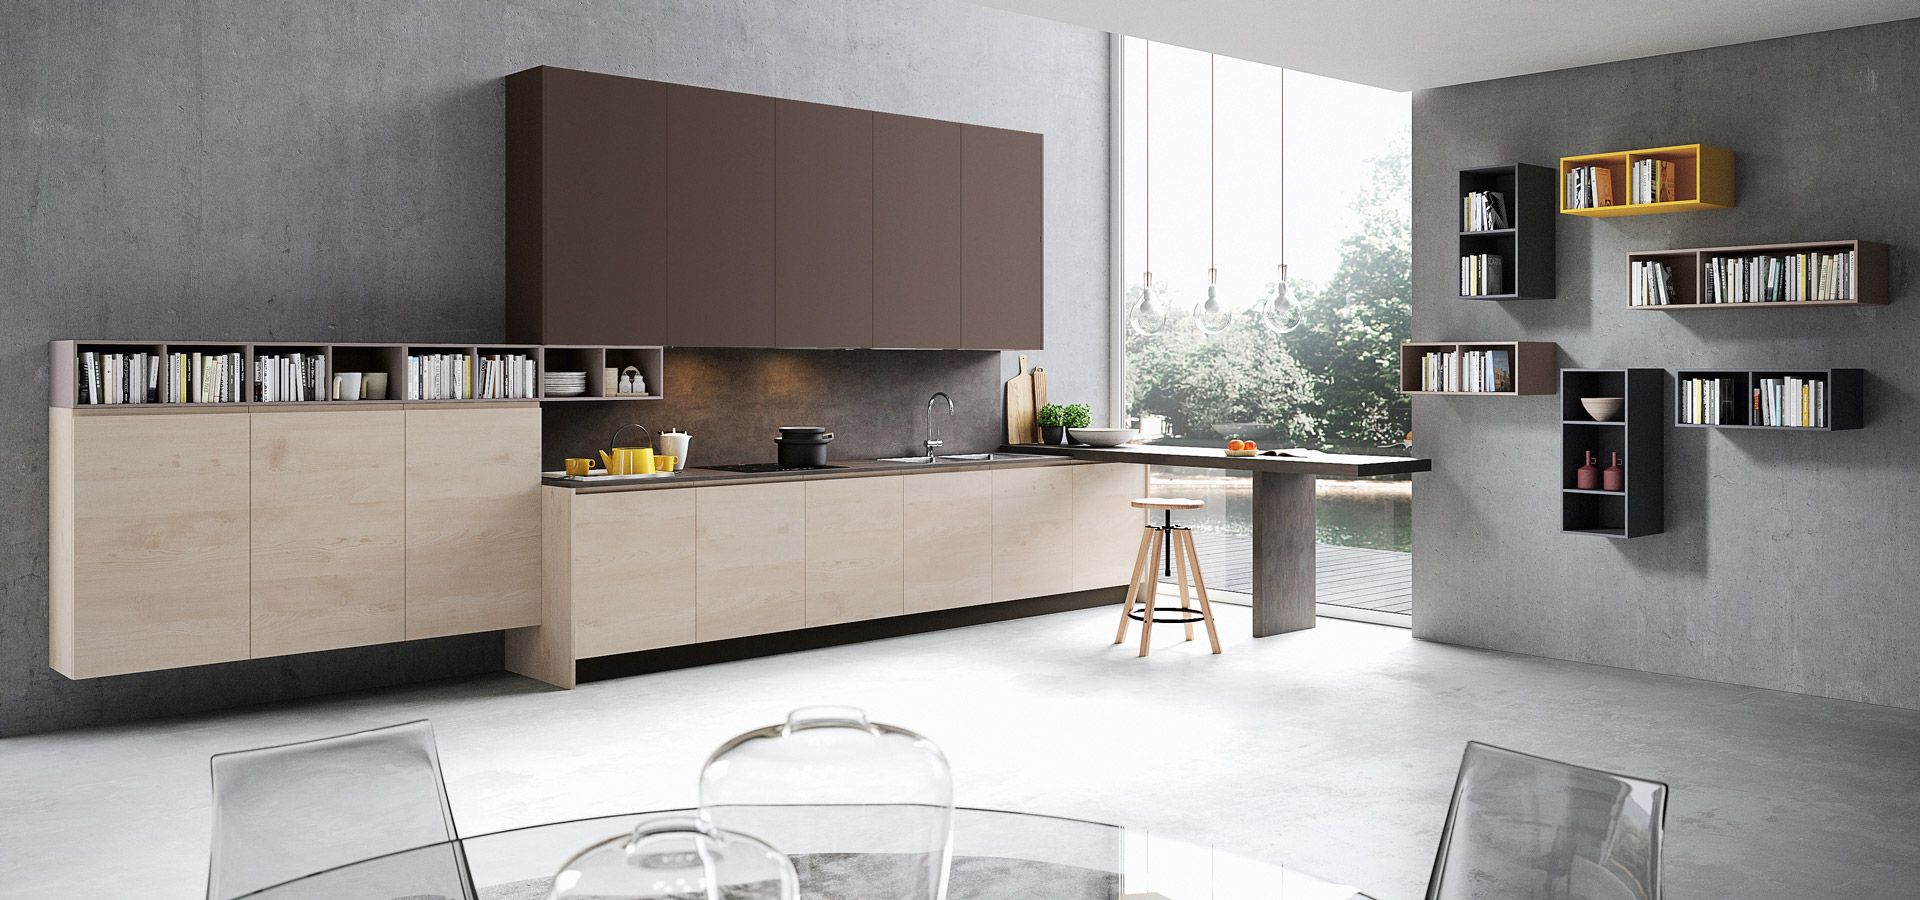 Cucina Moderna - Wega Finitura laccato ecrù opaco | Piano in Okite ...